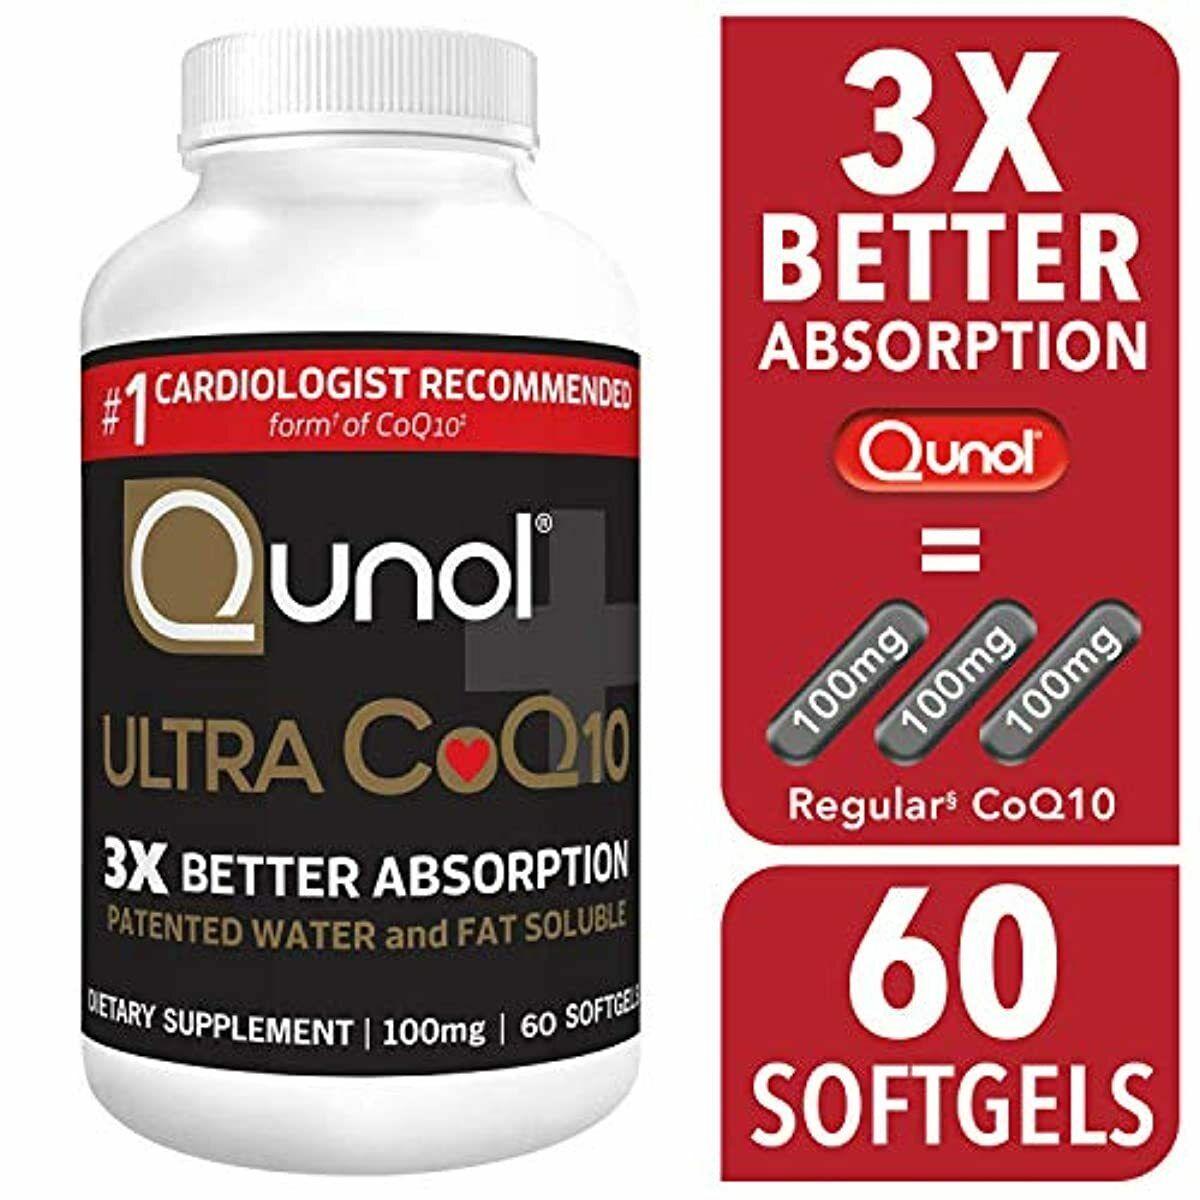 Qunol Ultra CoQ10 Dietary Supplement Softgels, 100mg, 60 cou